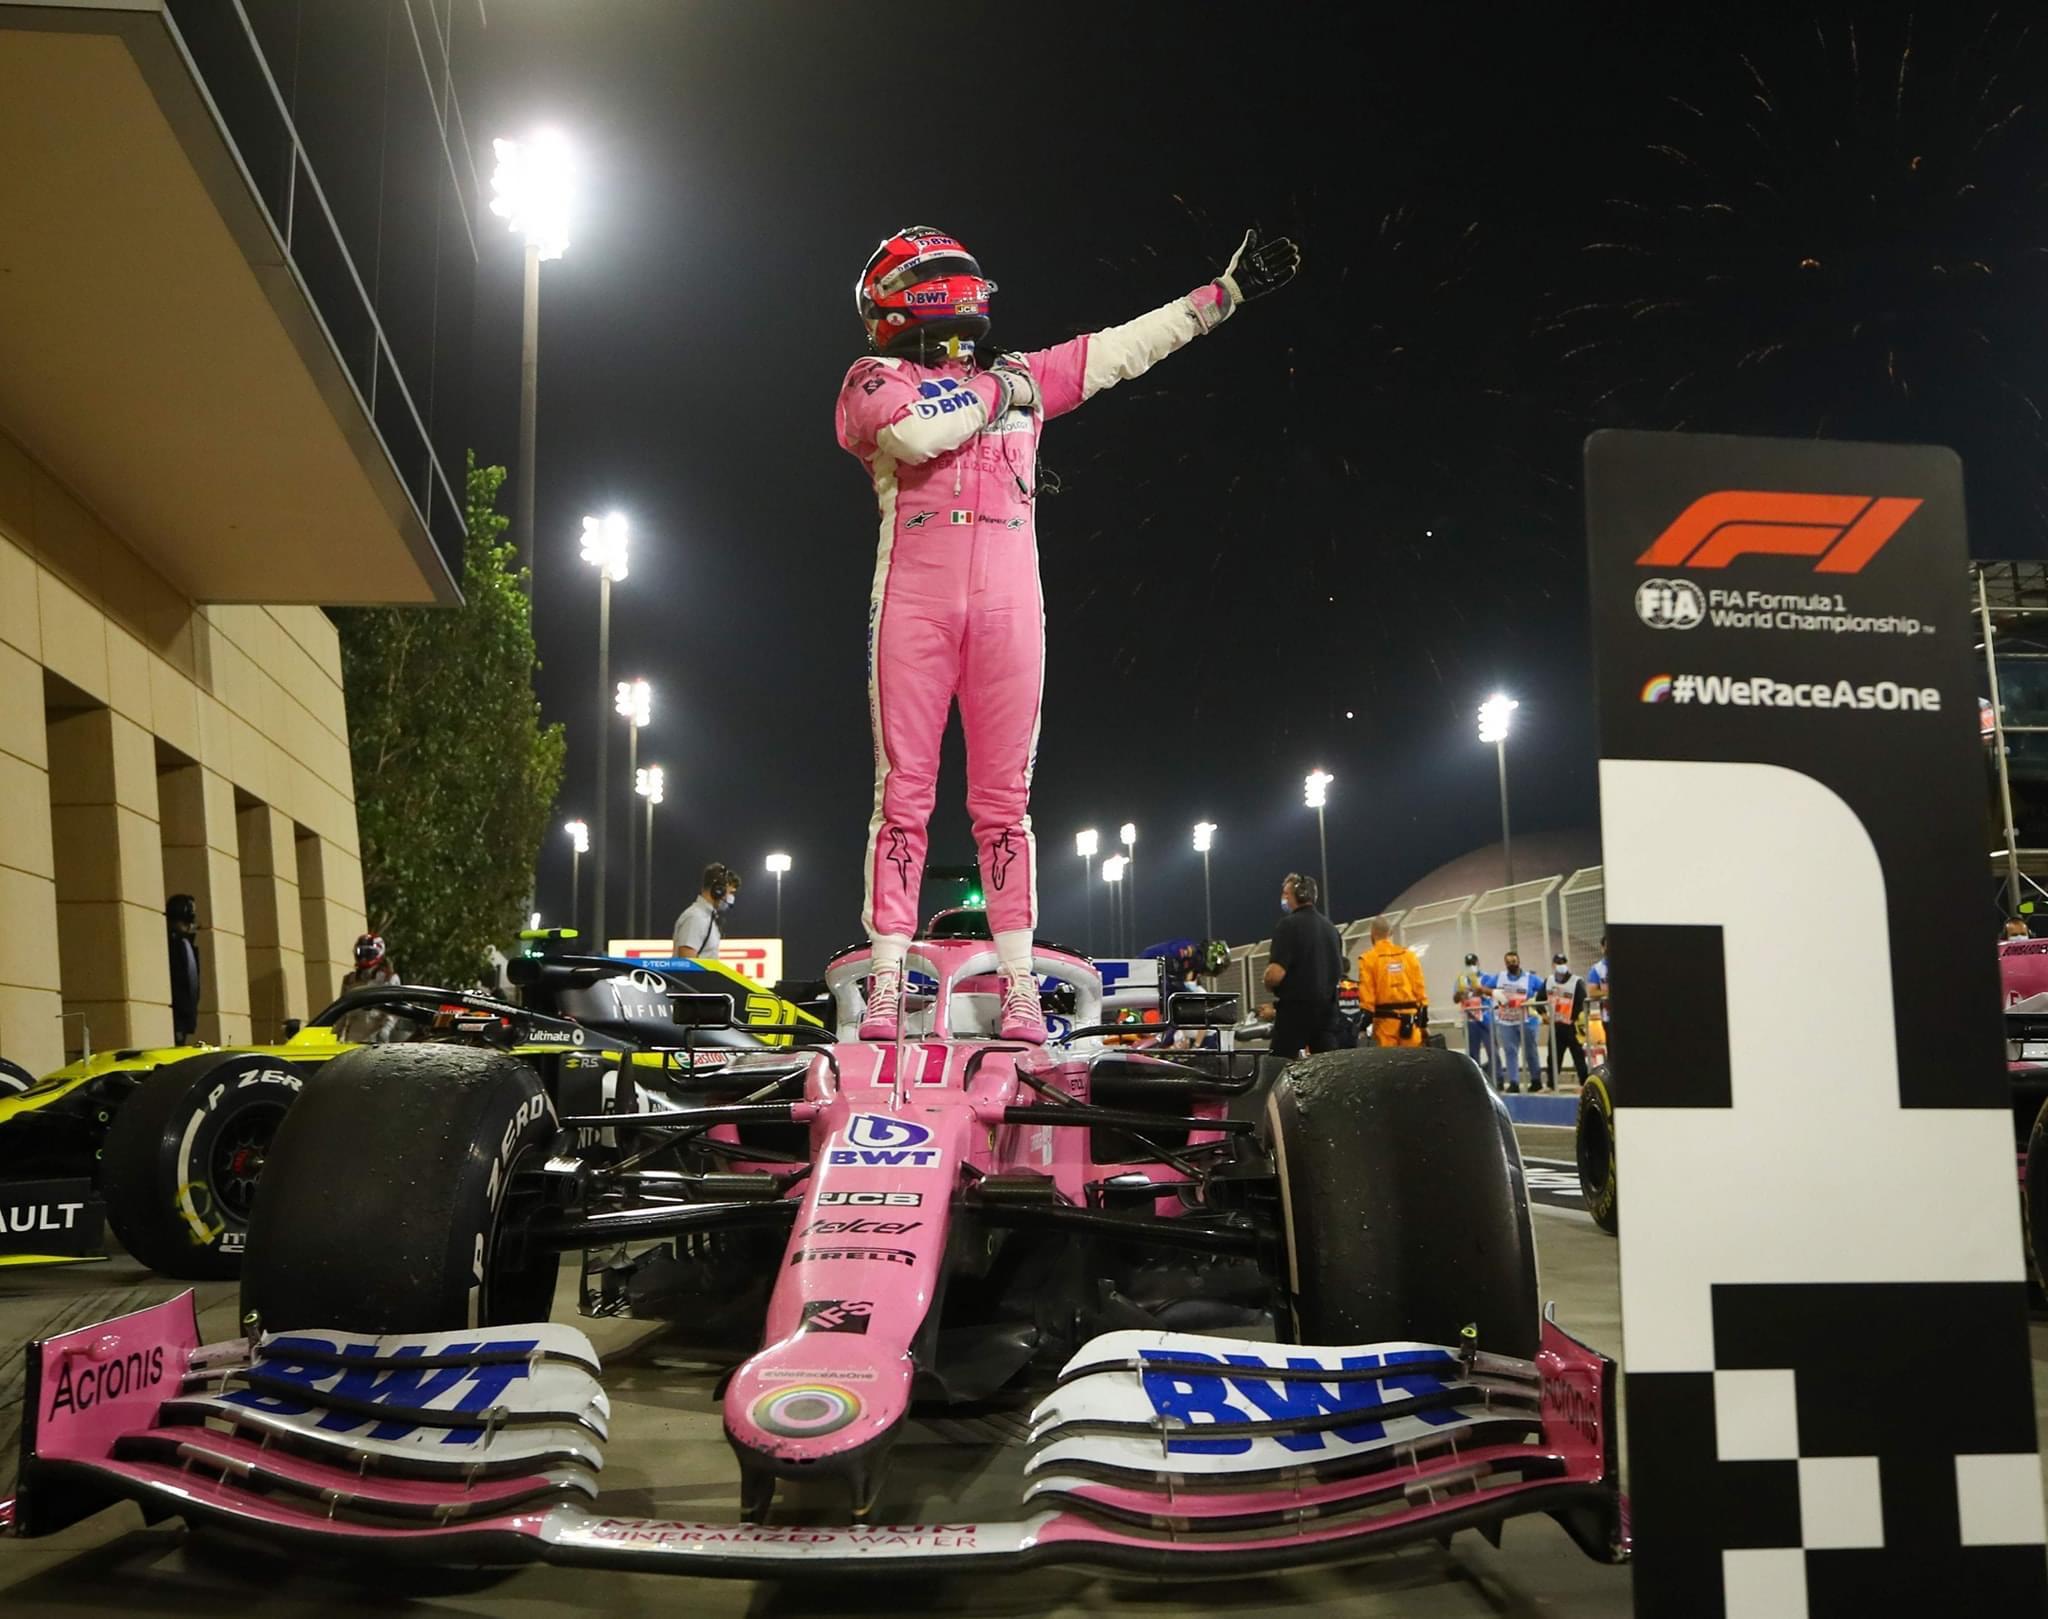 Histórico! Checo Pérez gana el Gran Premio de Sakhir de Fórmula 1